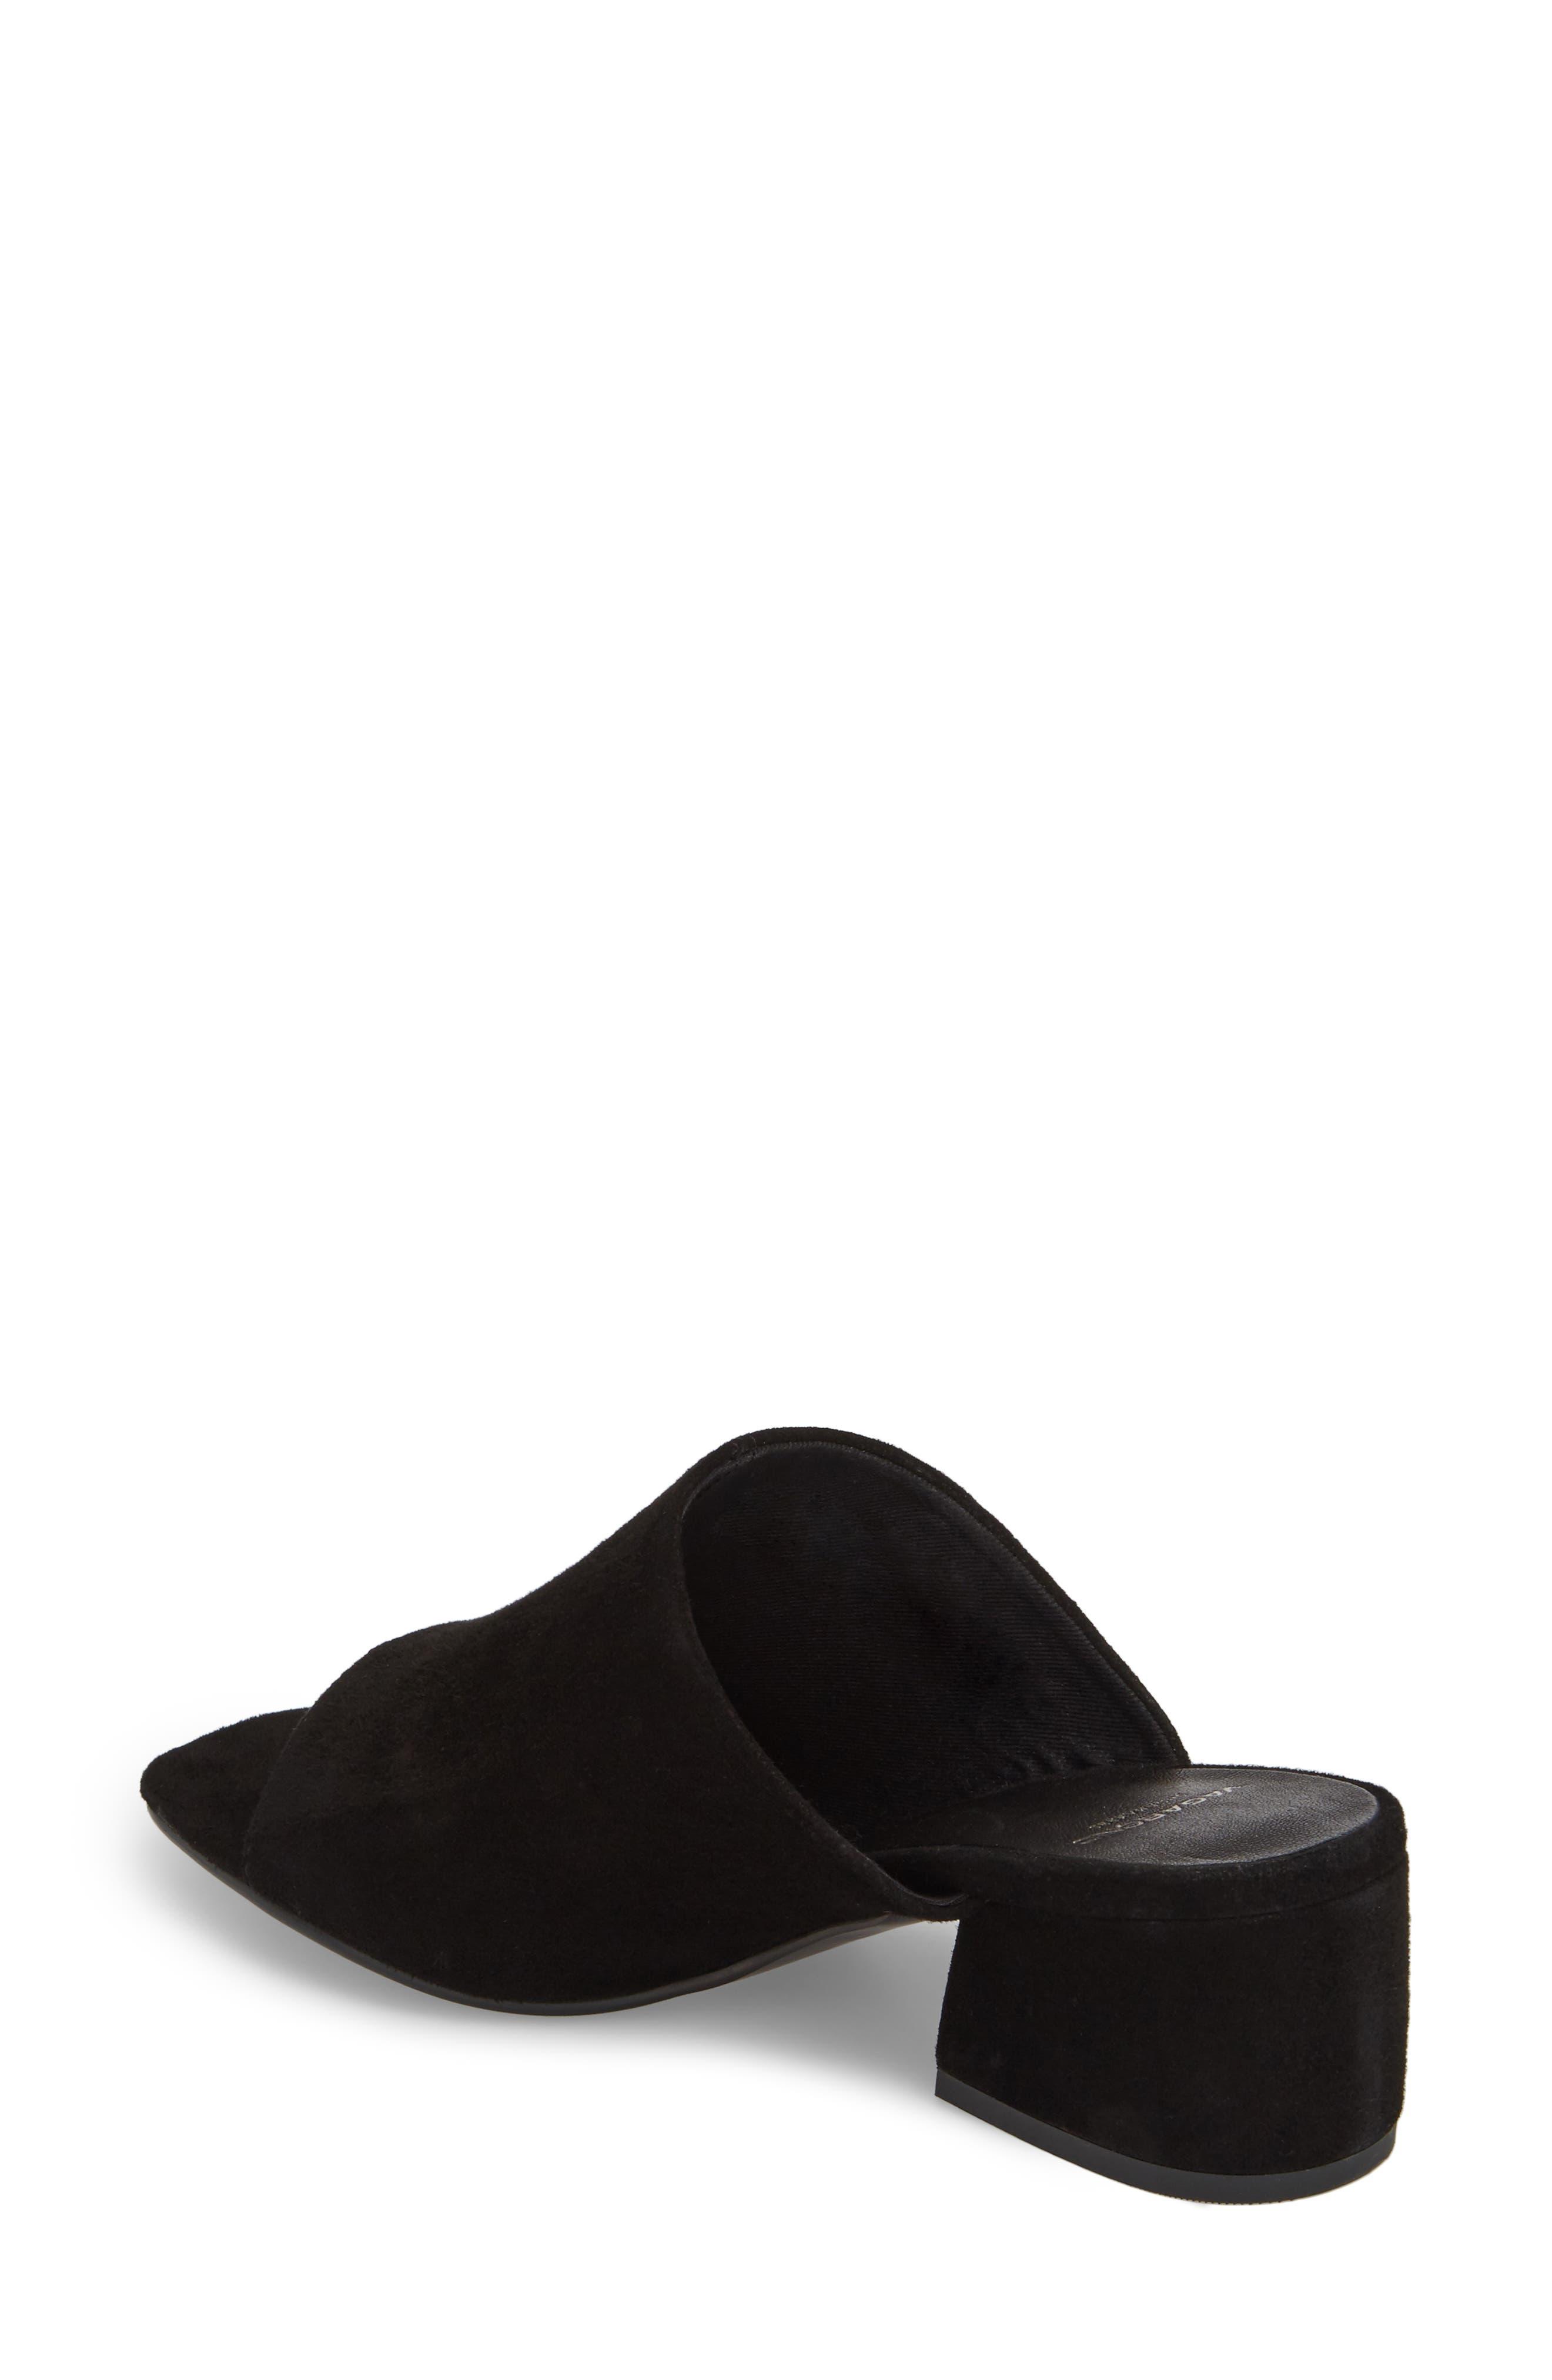 Saide Slide Sandal,                             Alternate thumbnail 2, color,                             BLACK SUEDE